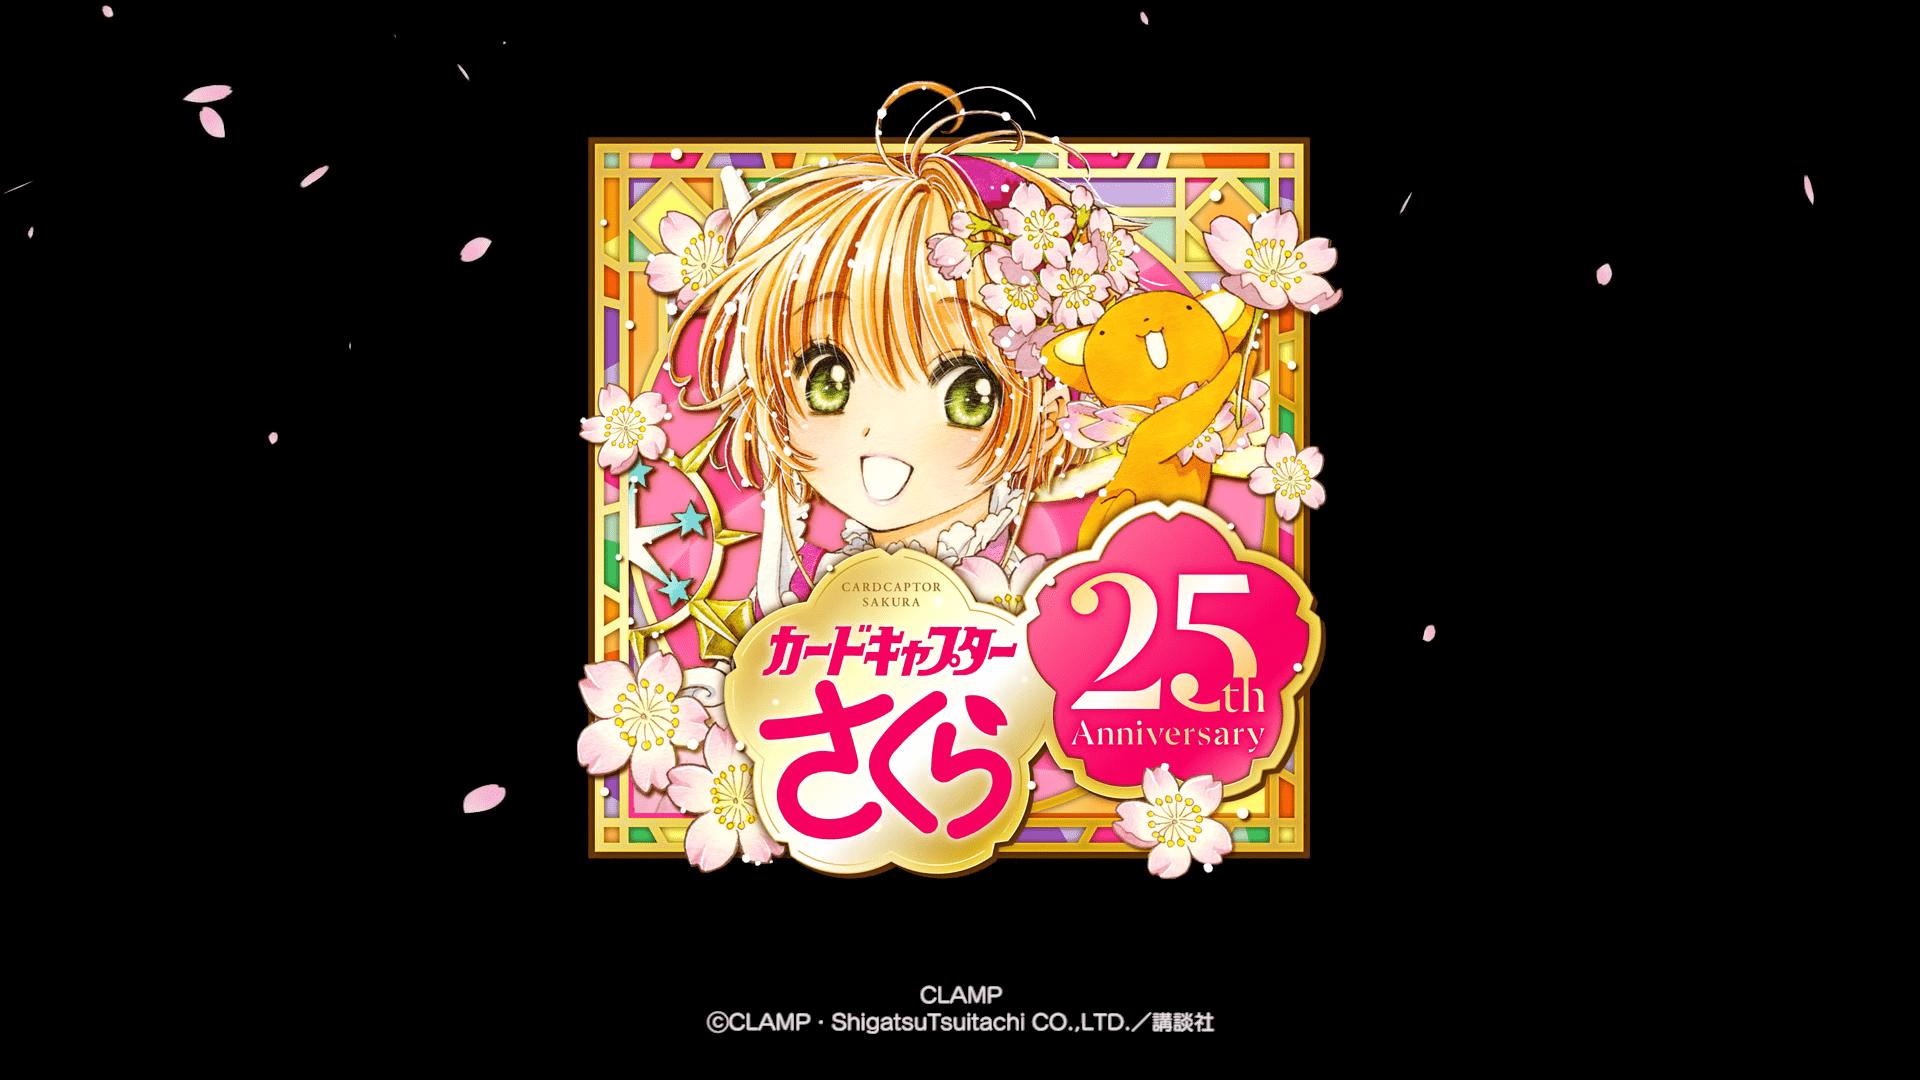 Cardcaptor Sakura 25th Anniversary